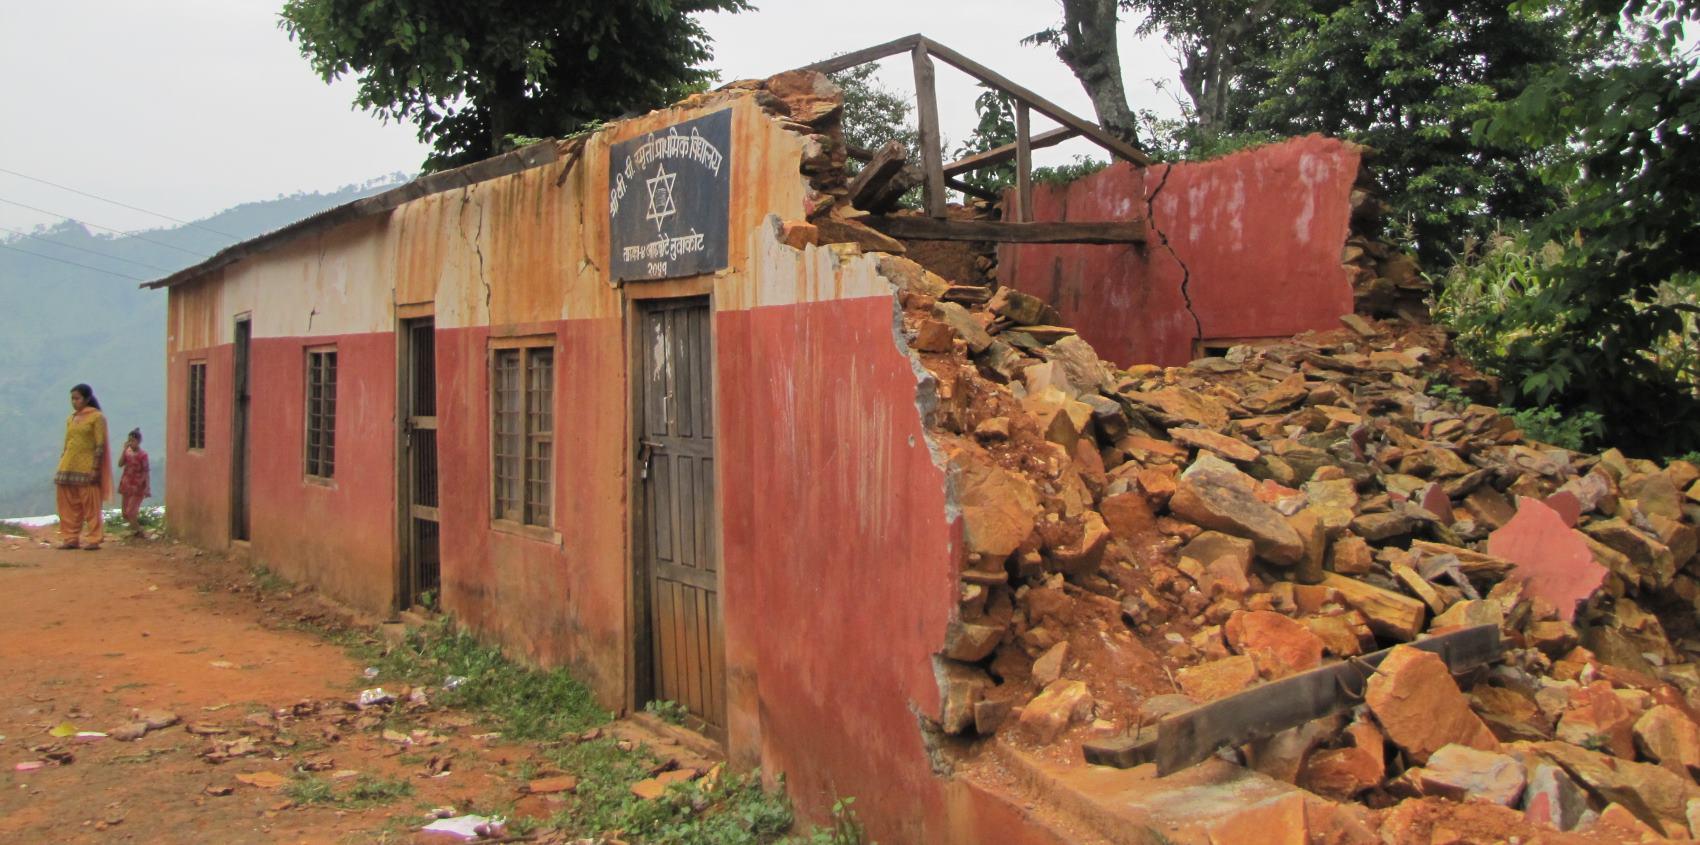 Zerstörte Schule in Taruka